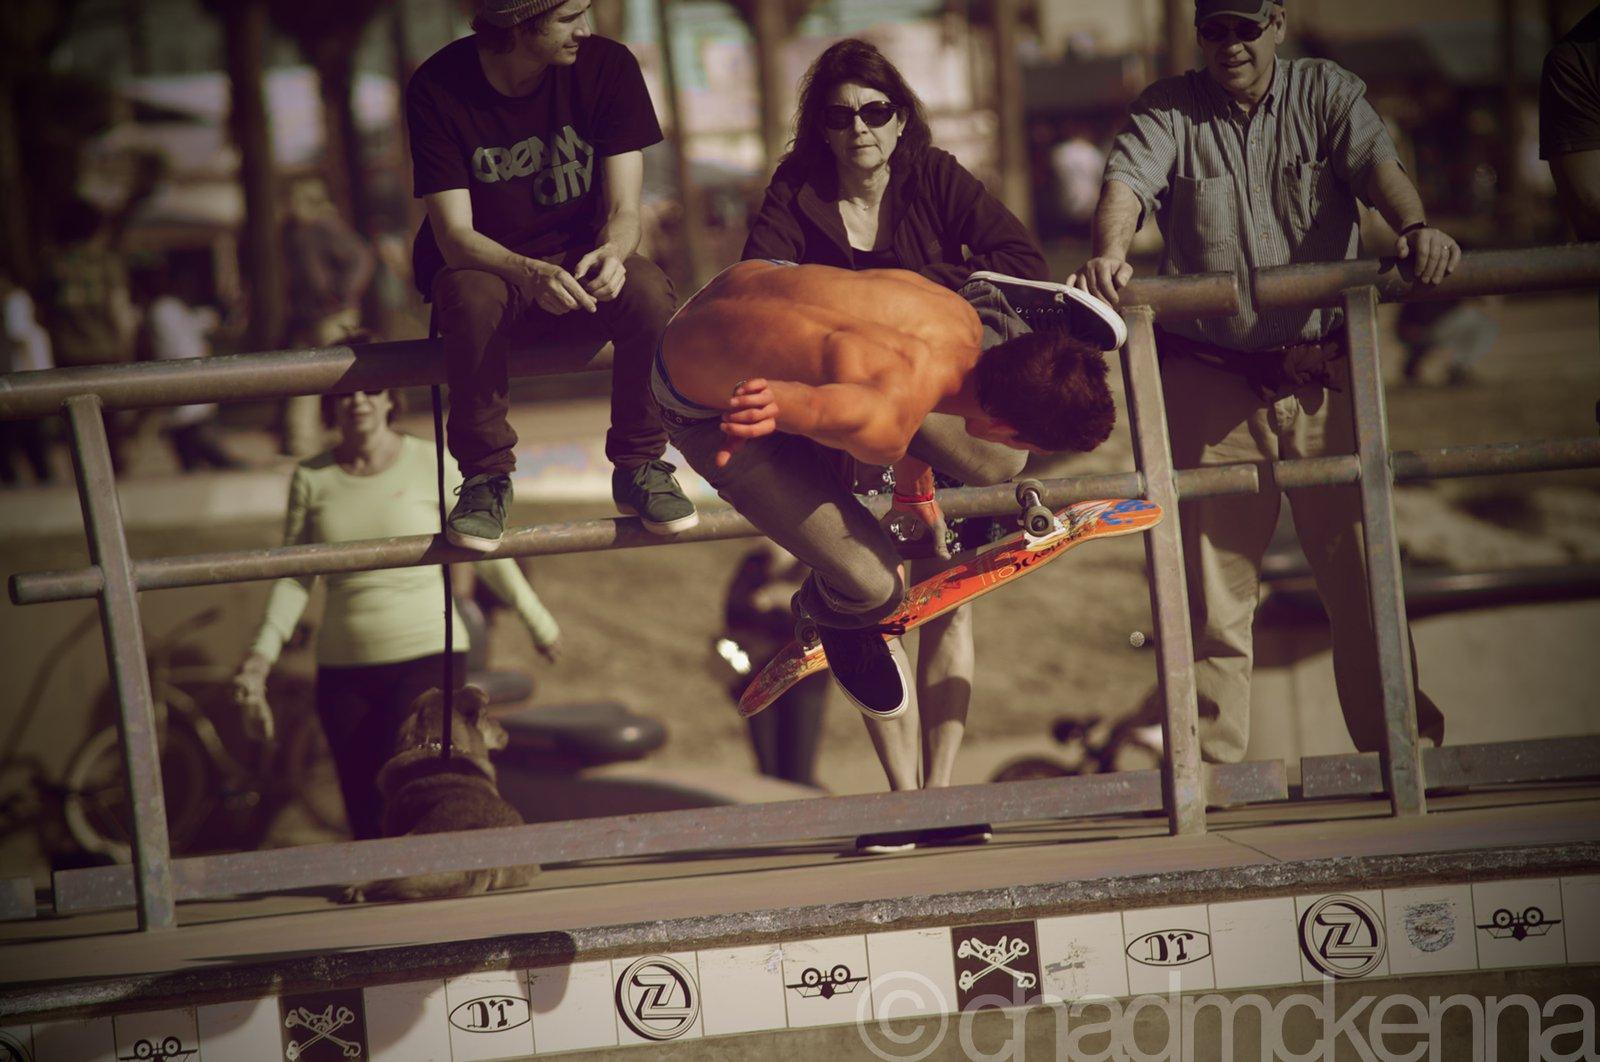 Kickflip to Melon